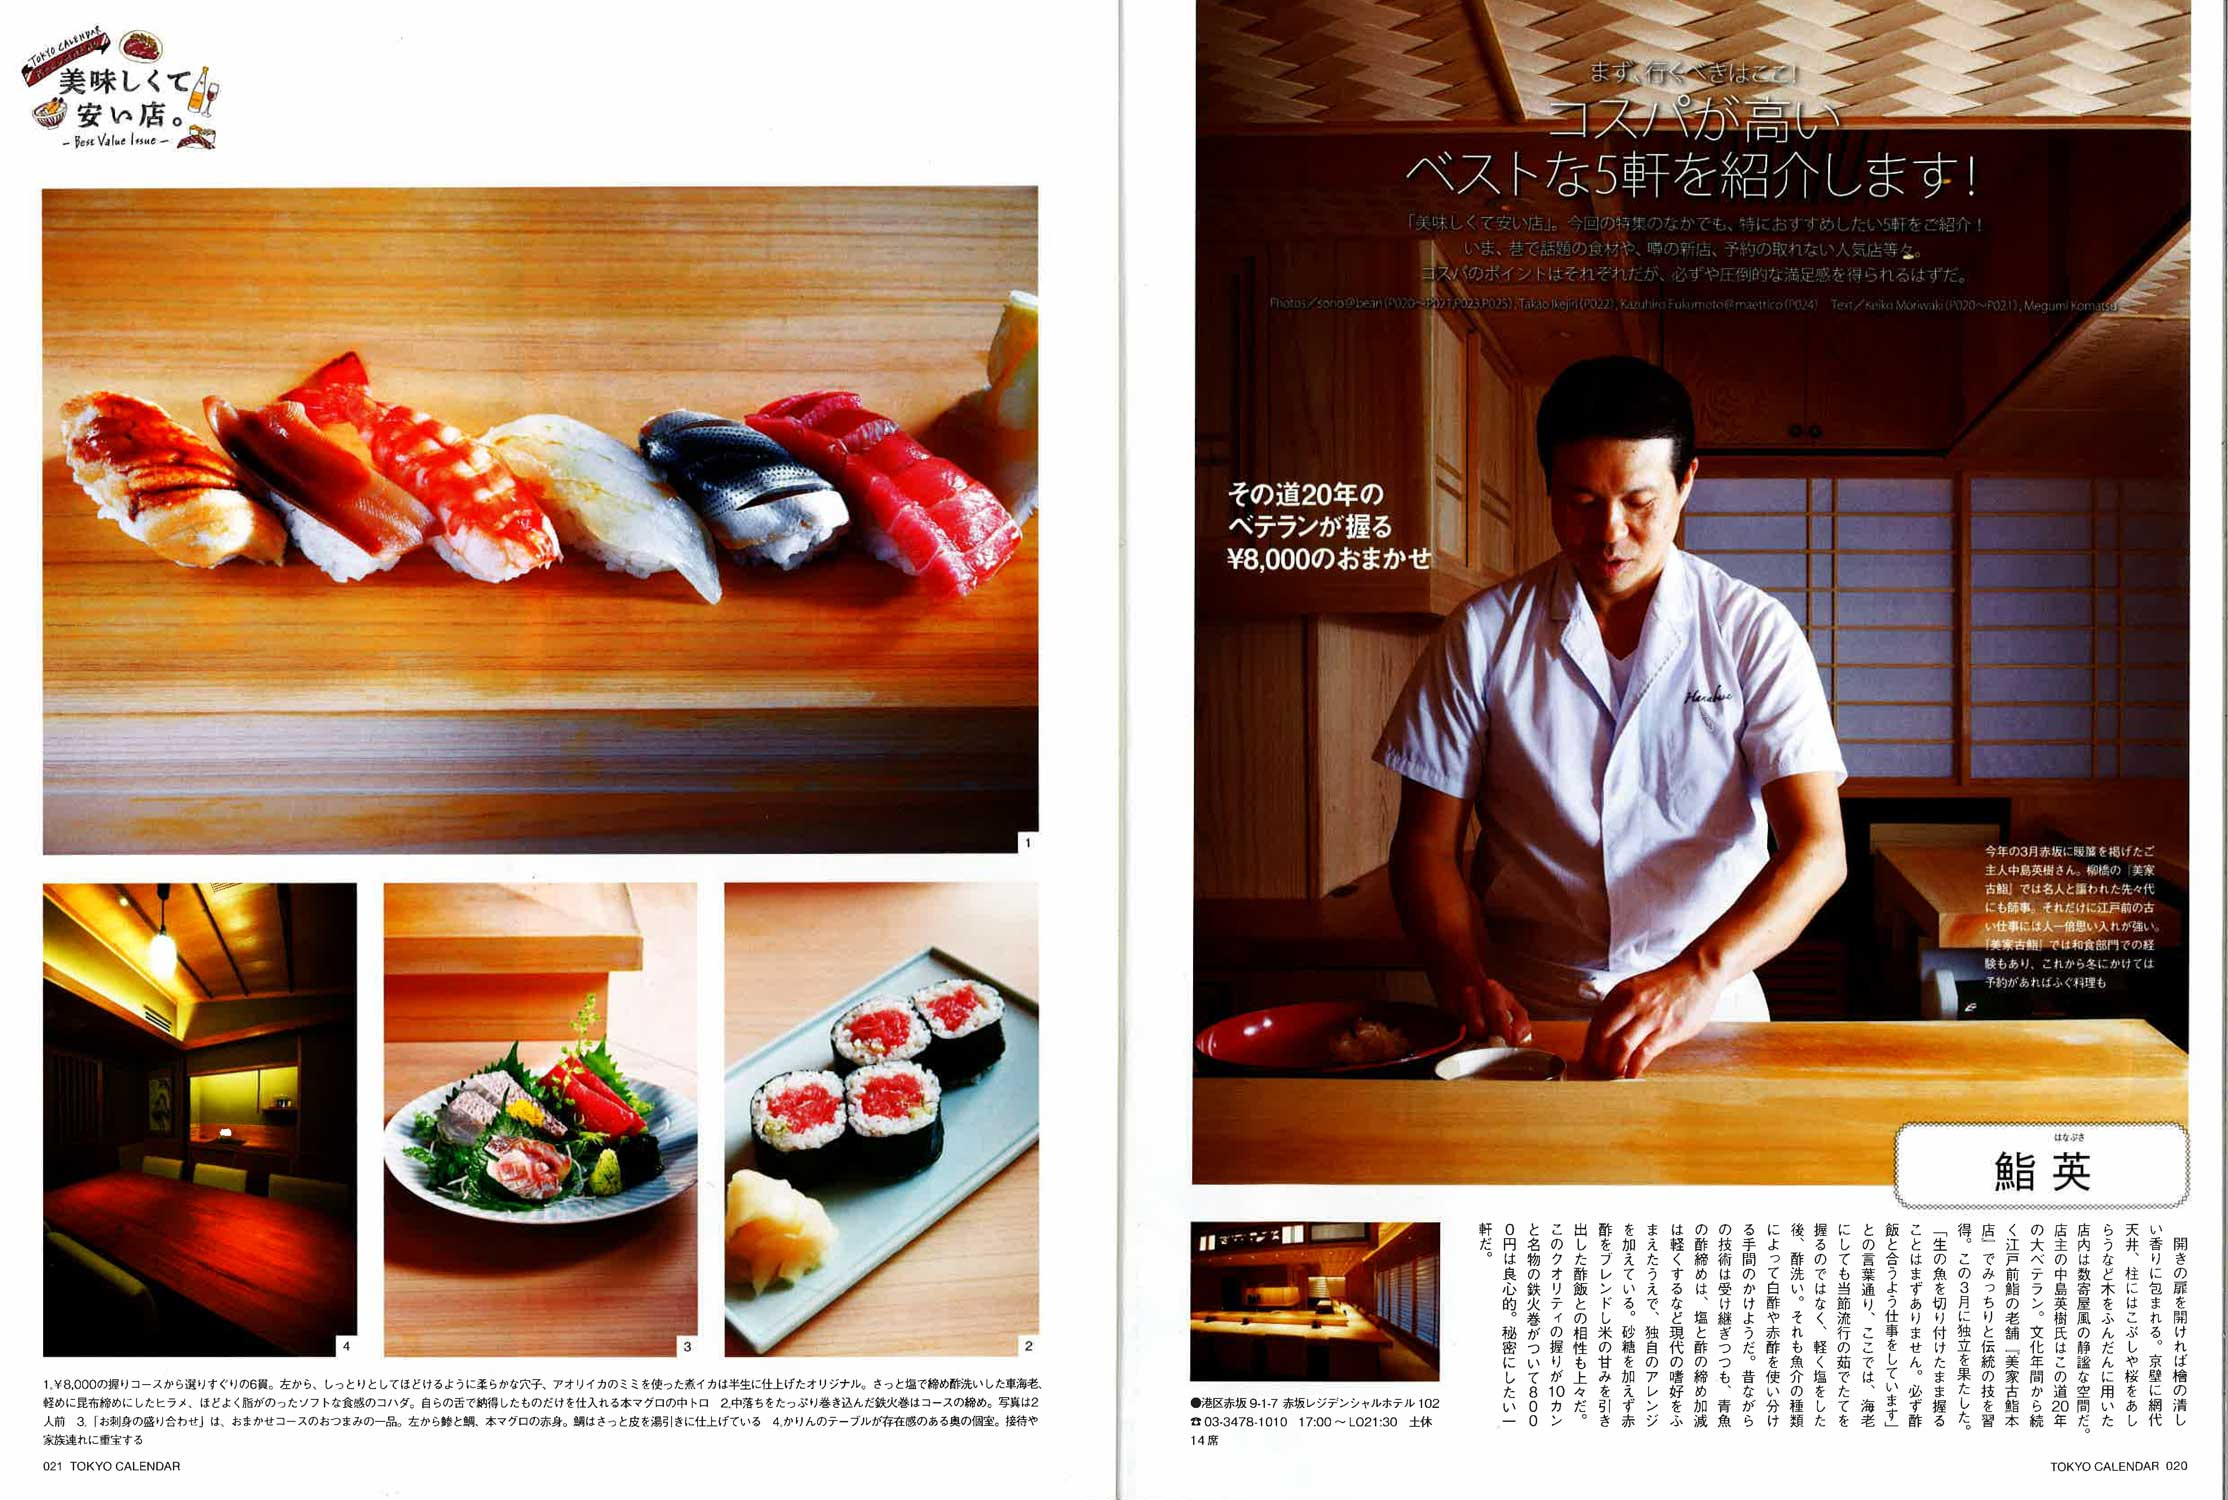 Tokyo Calendar November 2015 issue